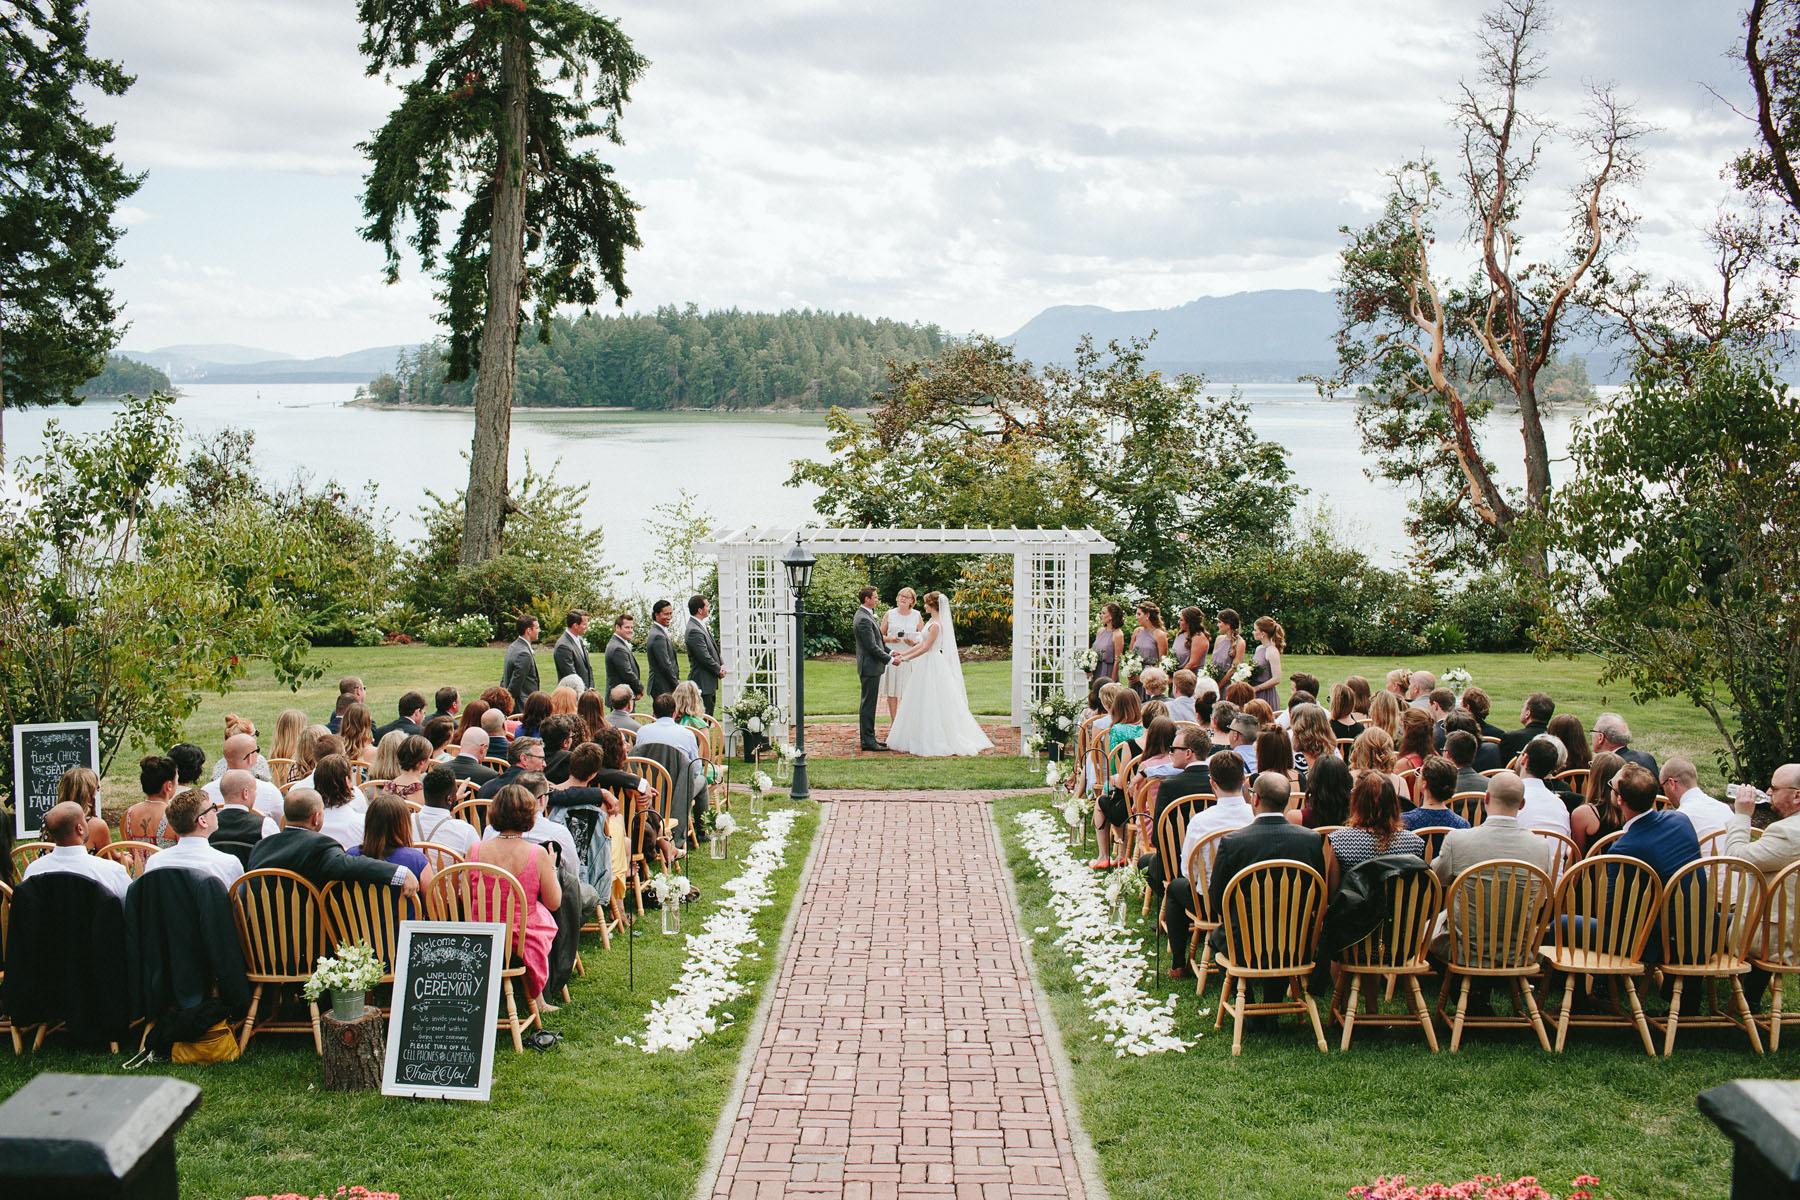 thetis-island-wedding-photographer-rp-rn-081.jpg